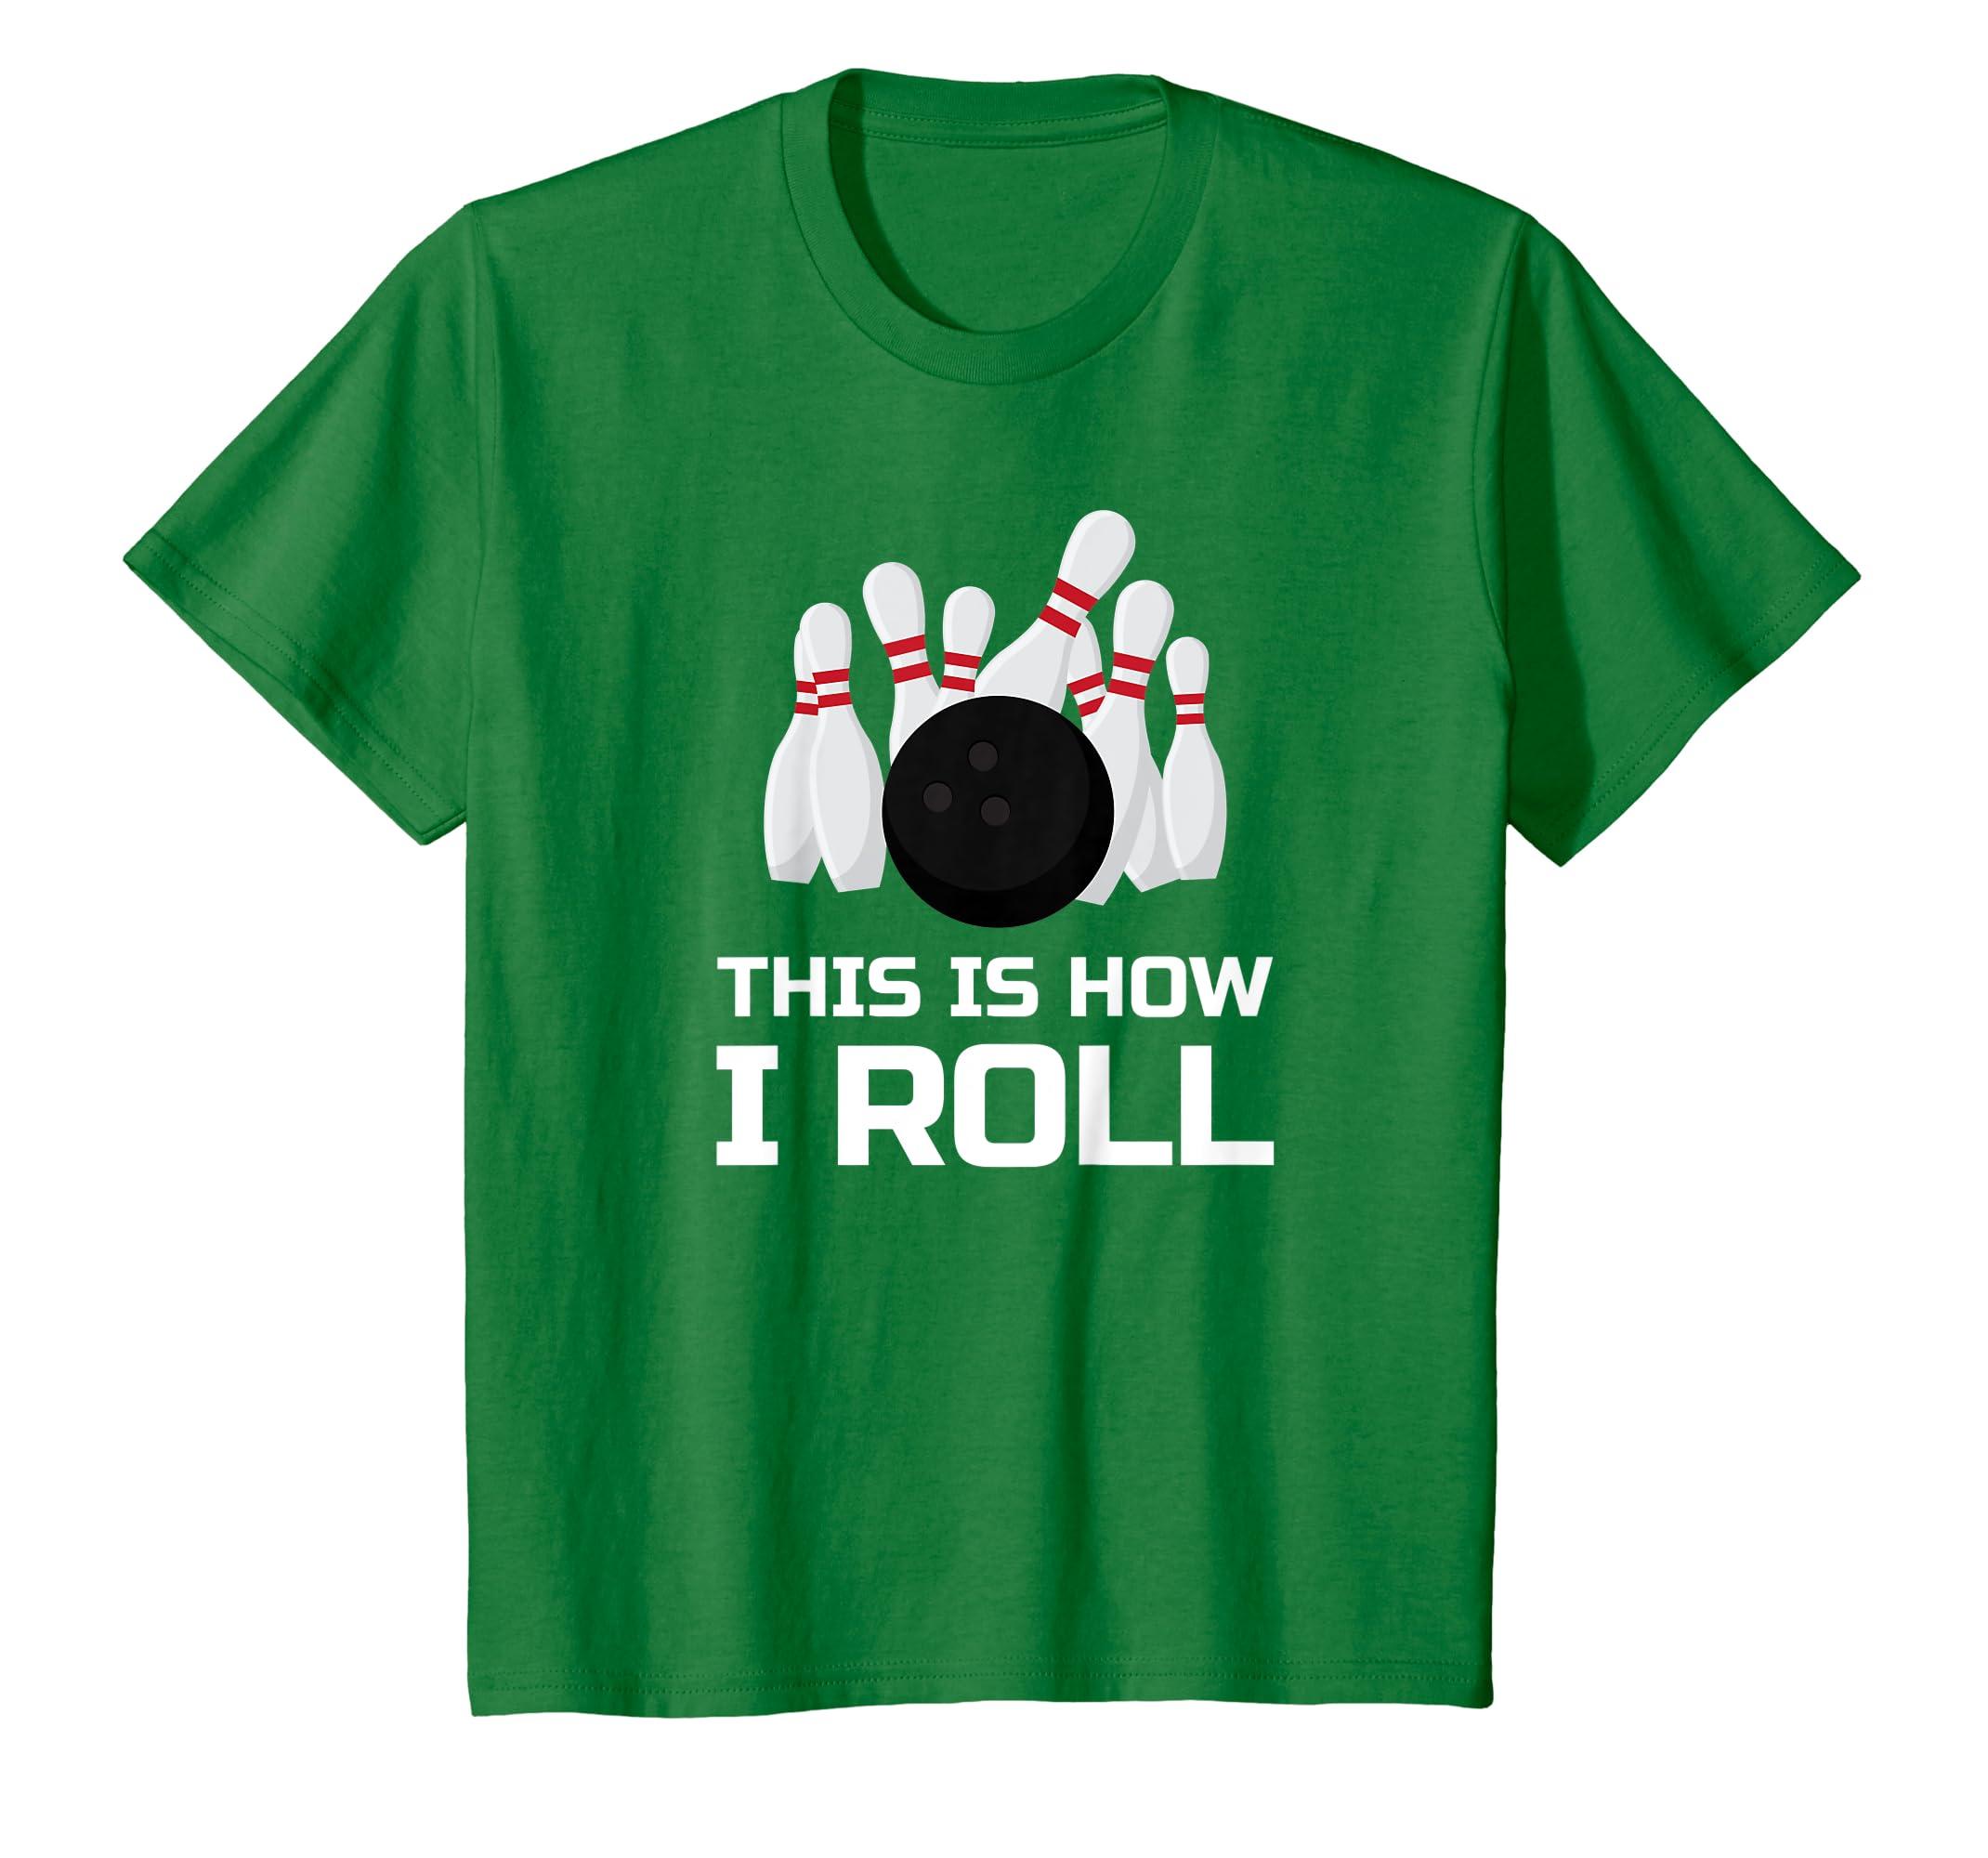 bf242f0e Amazon.com: Bowling T-Shirt: This is How I Roll Men Women Kids: Clothing